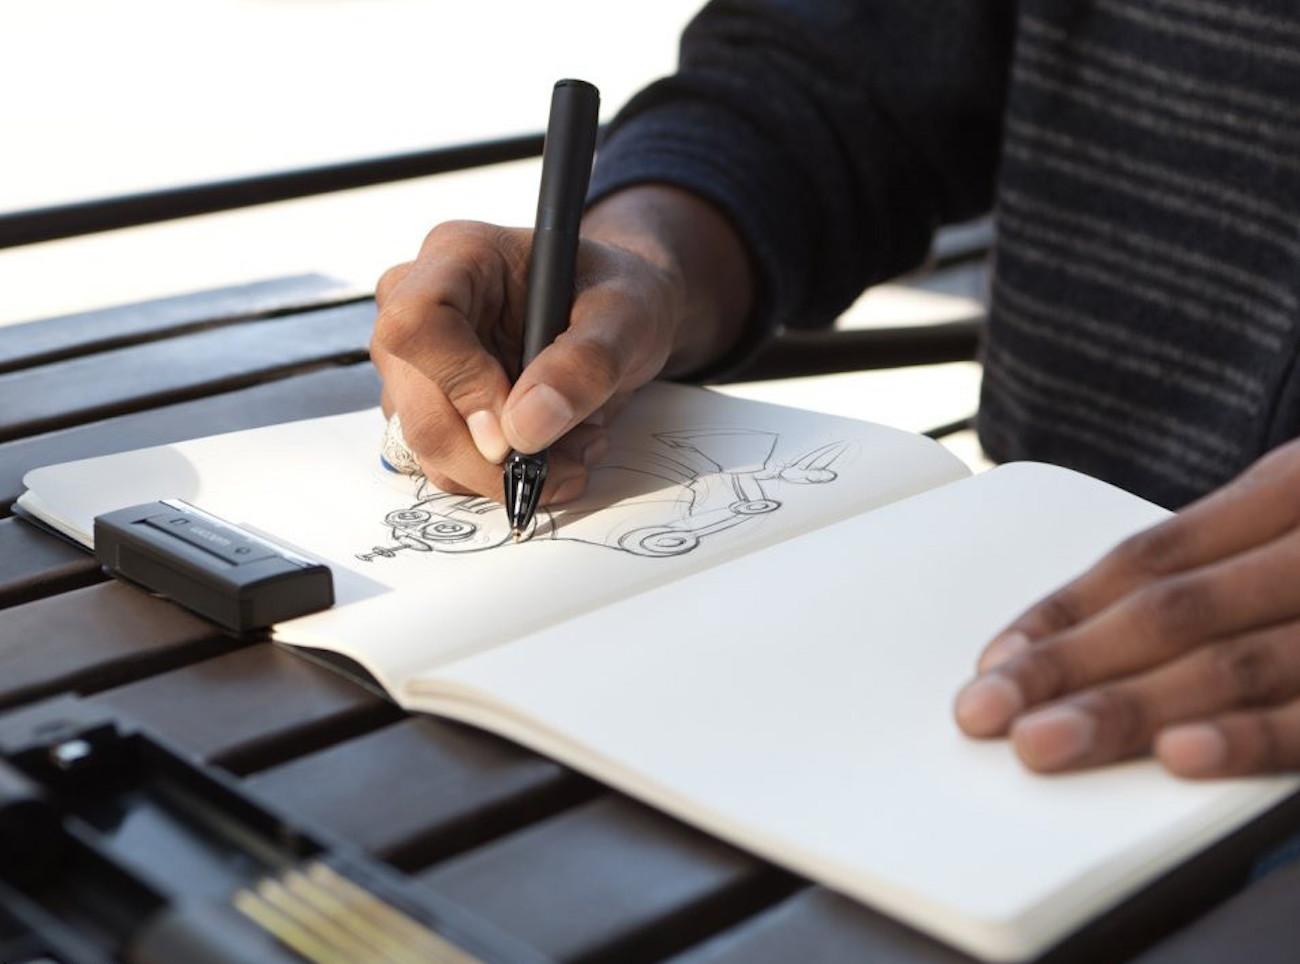 Wacom Inkling Digital Sketch Pen